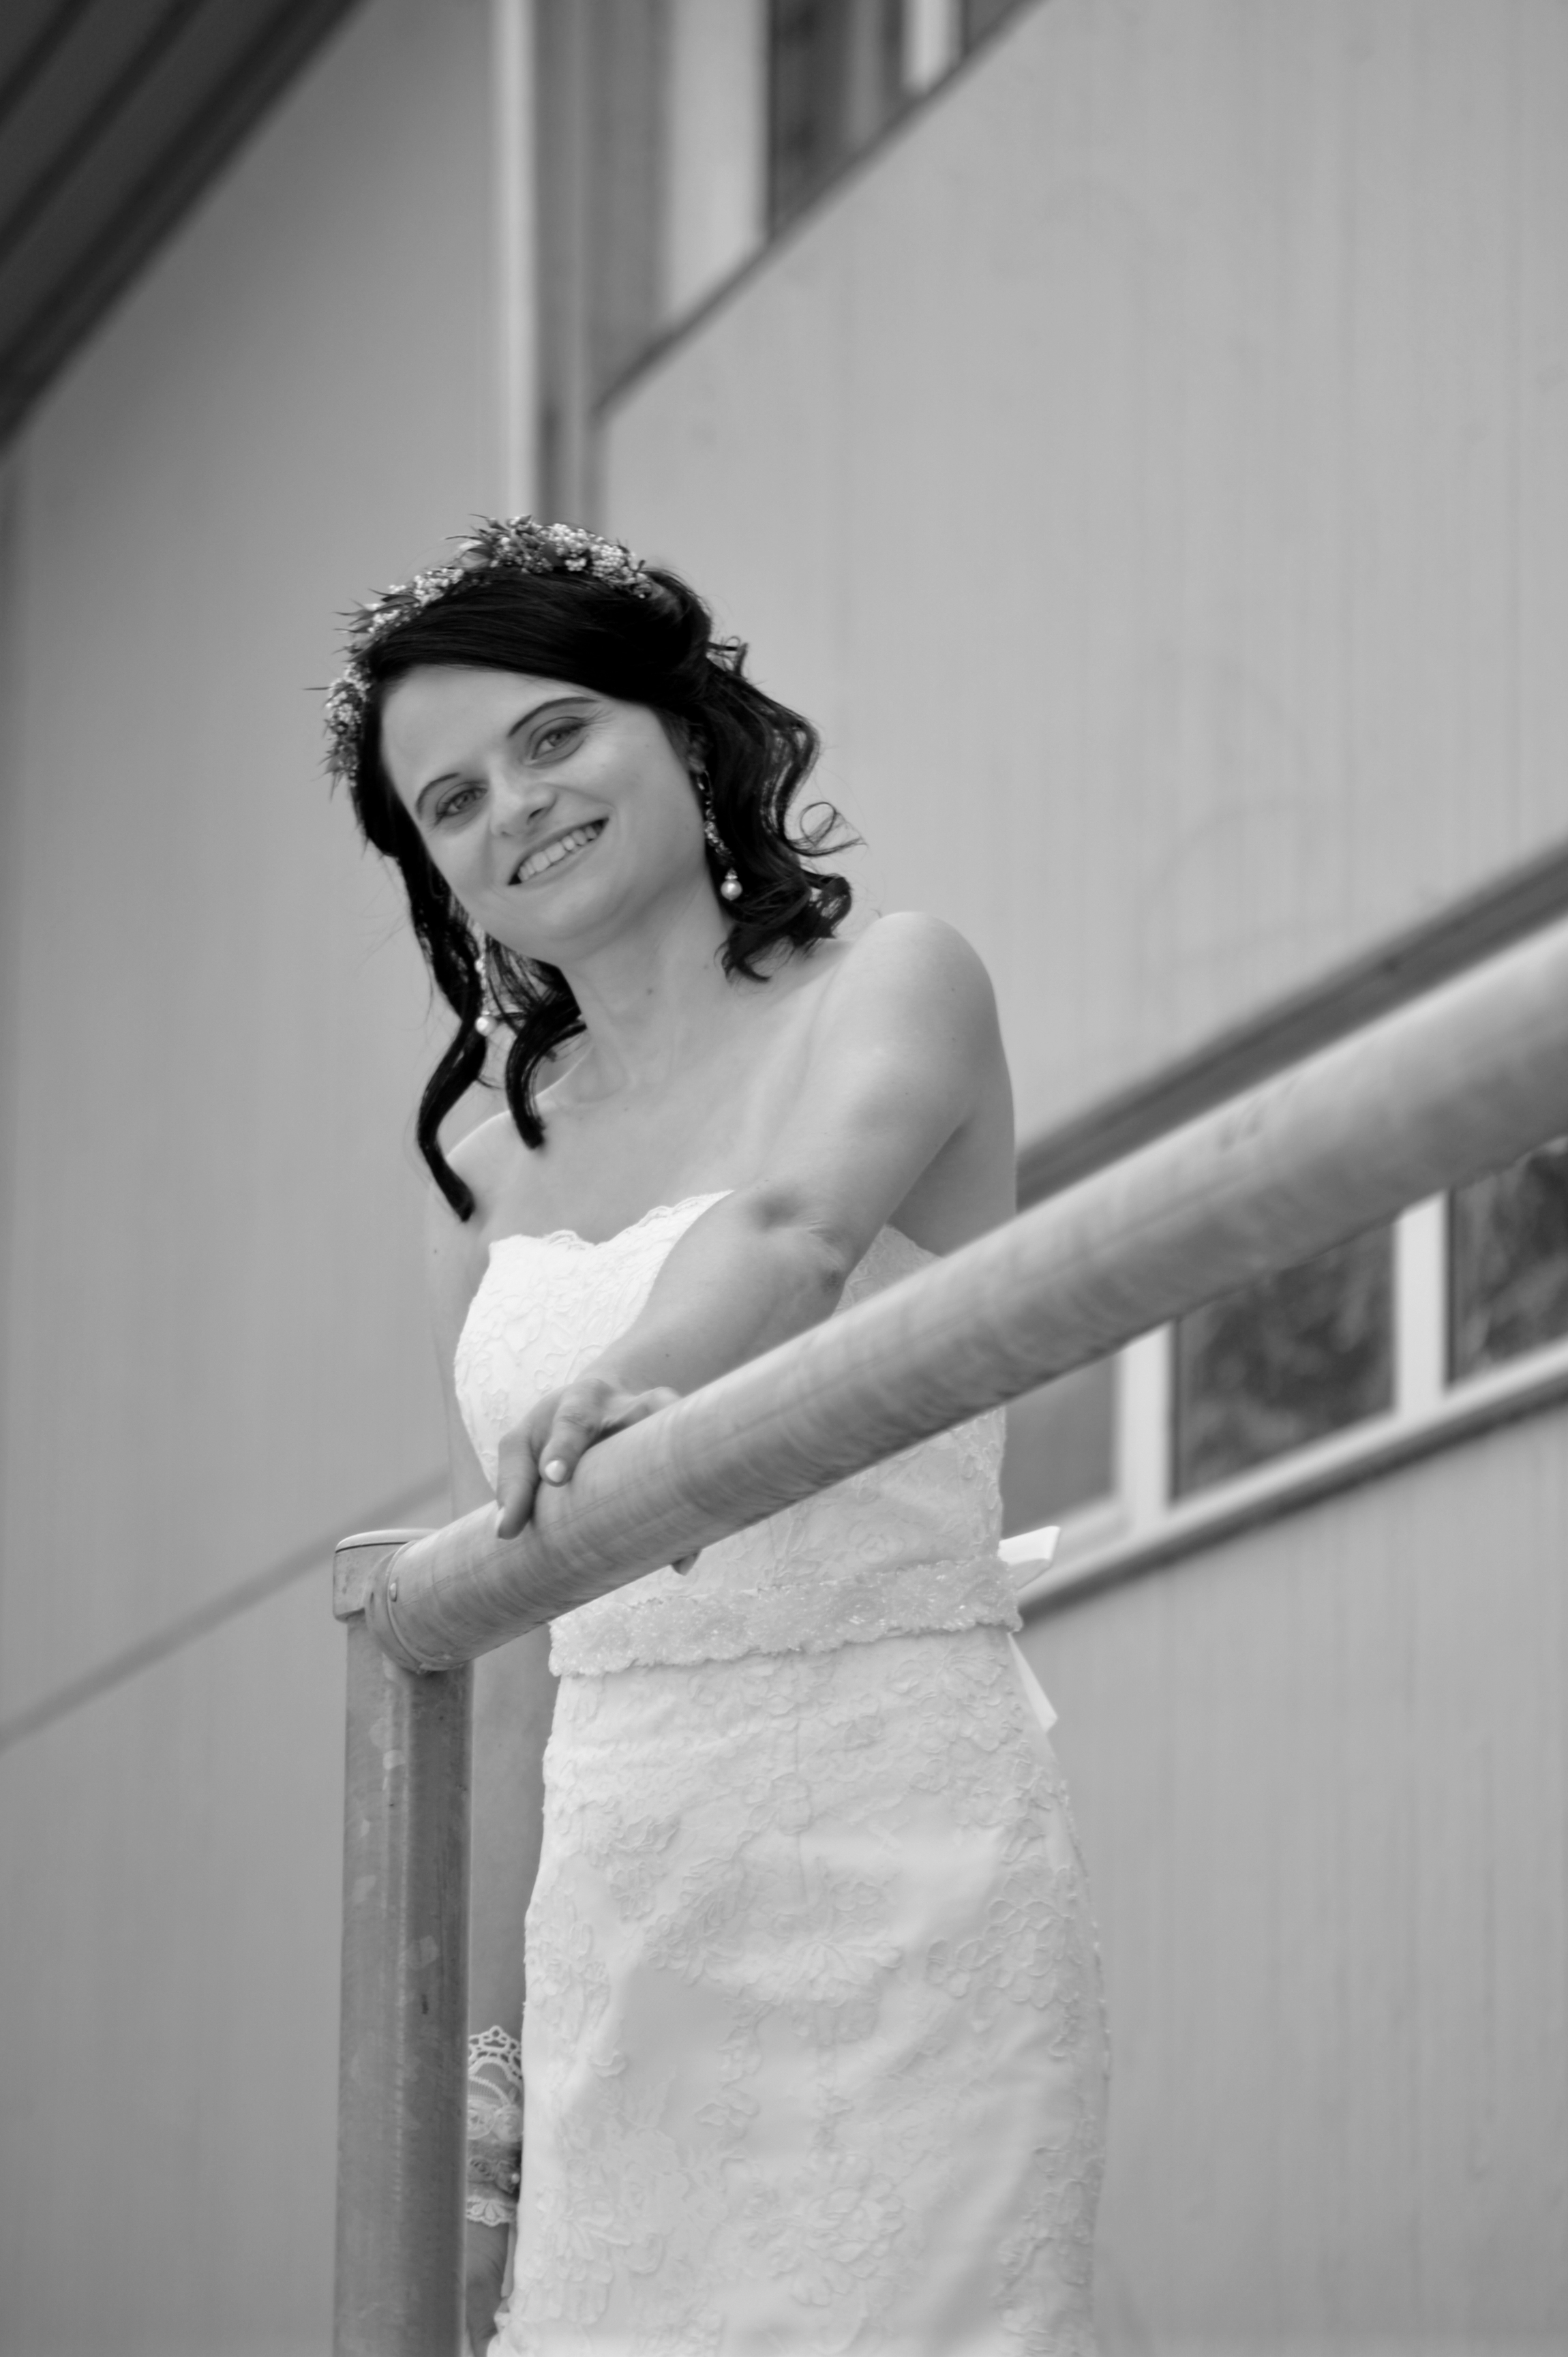 Portraitfotografie, Hochzeitsshooting, Silke Berg, individuellefotografie.de, Offenburg, Braut, Fotografien